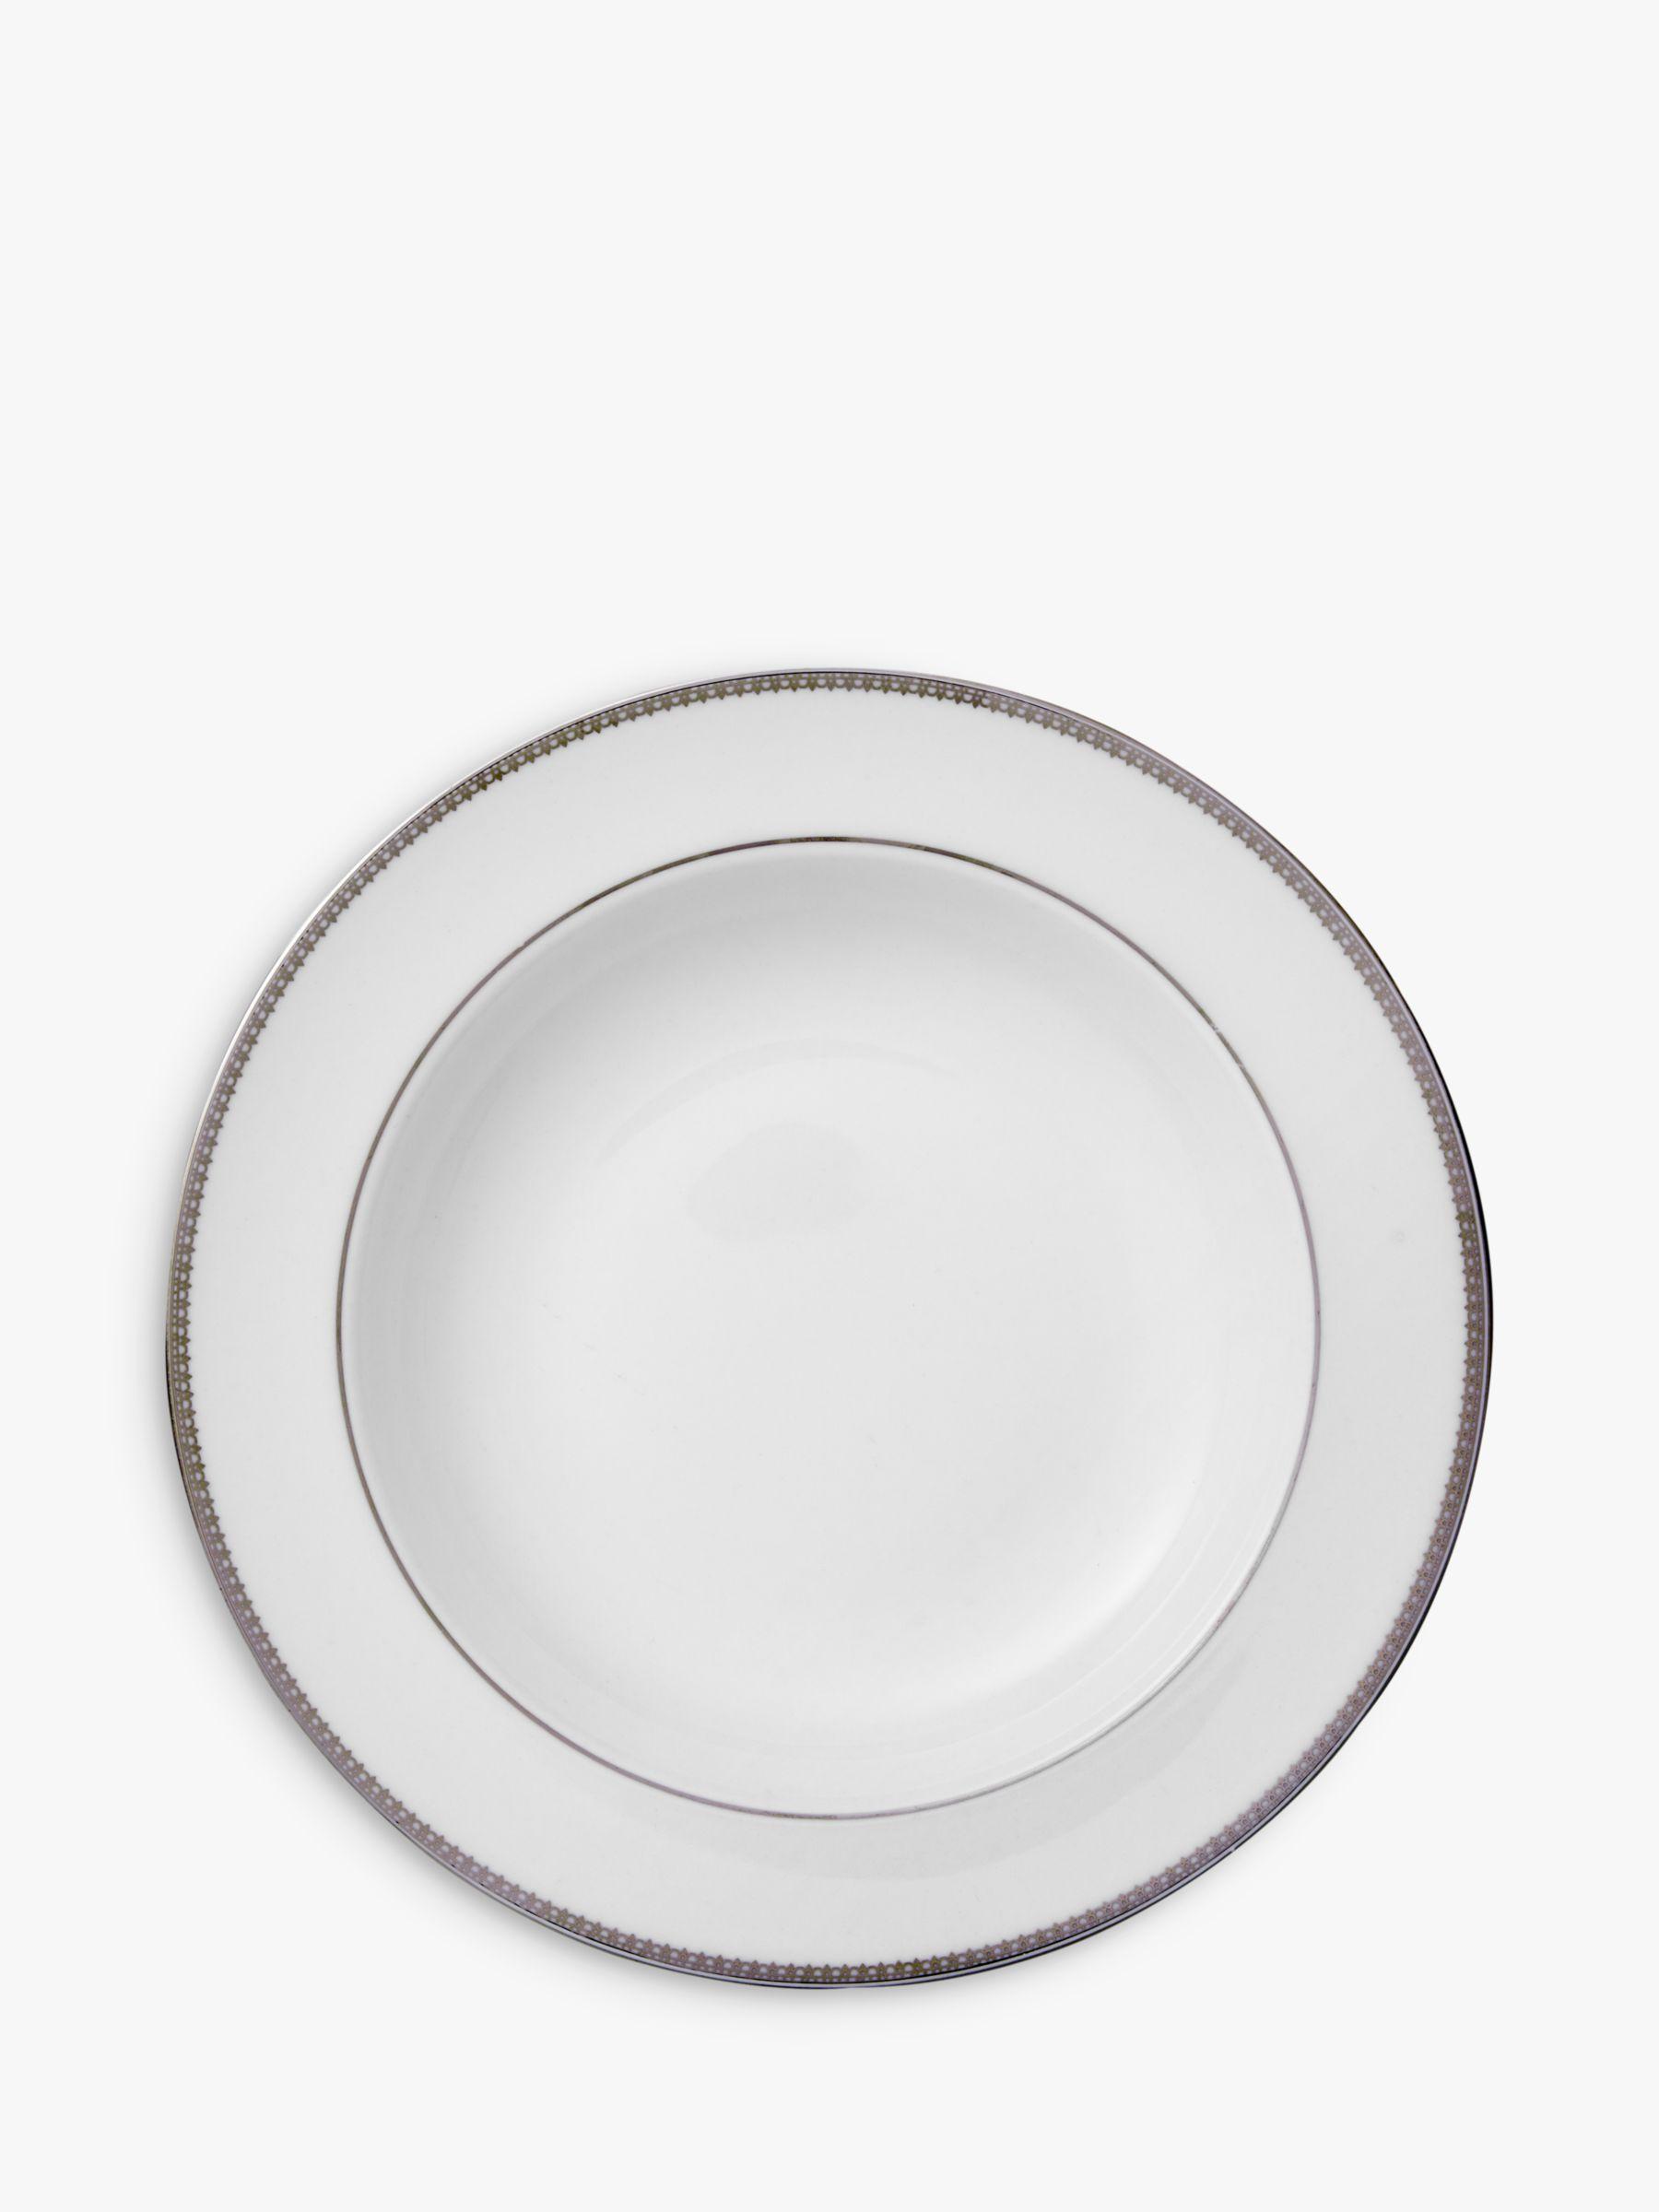 Vera Wang for Wedgwood Vera Wang for Wedgwood Lace Platinum 23cm Soup Plate, White